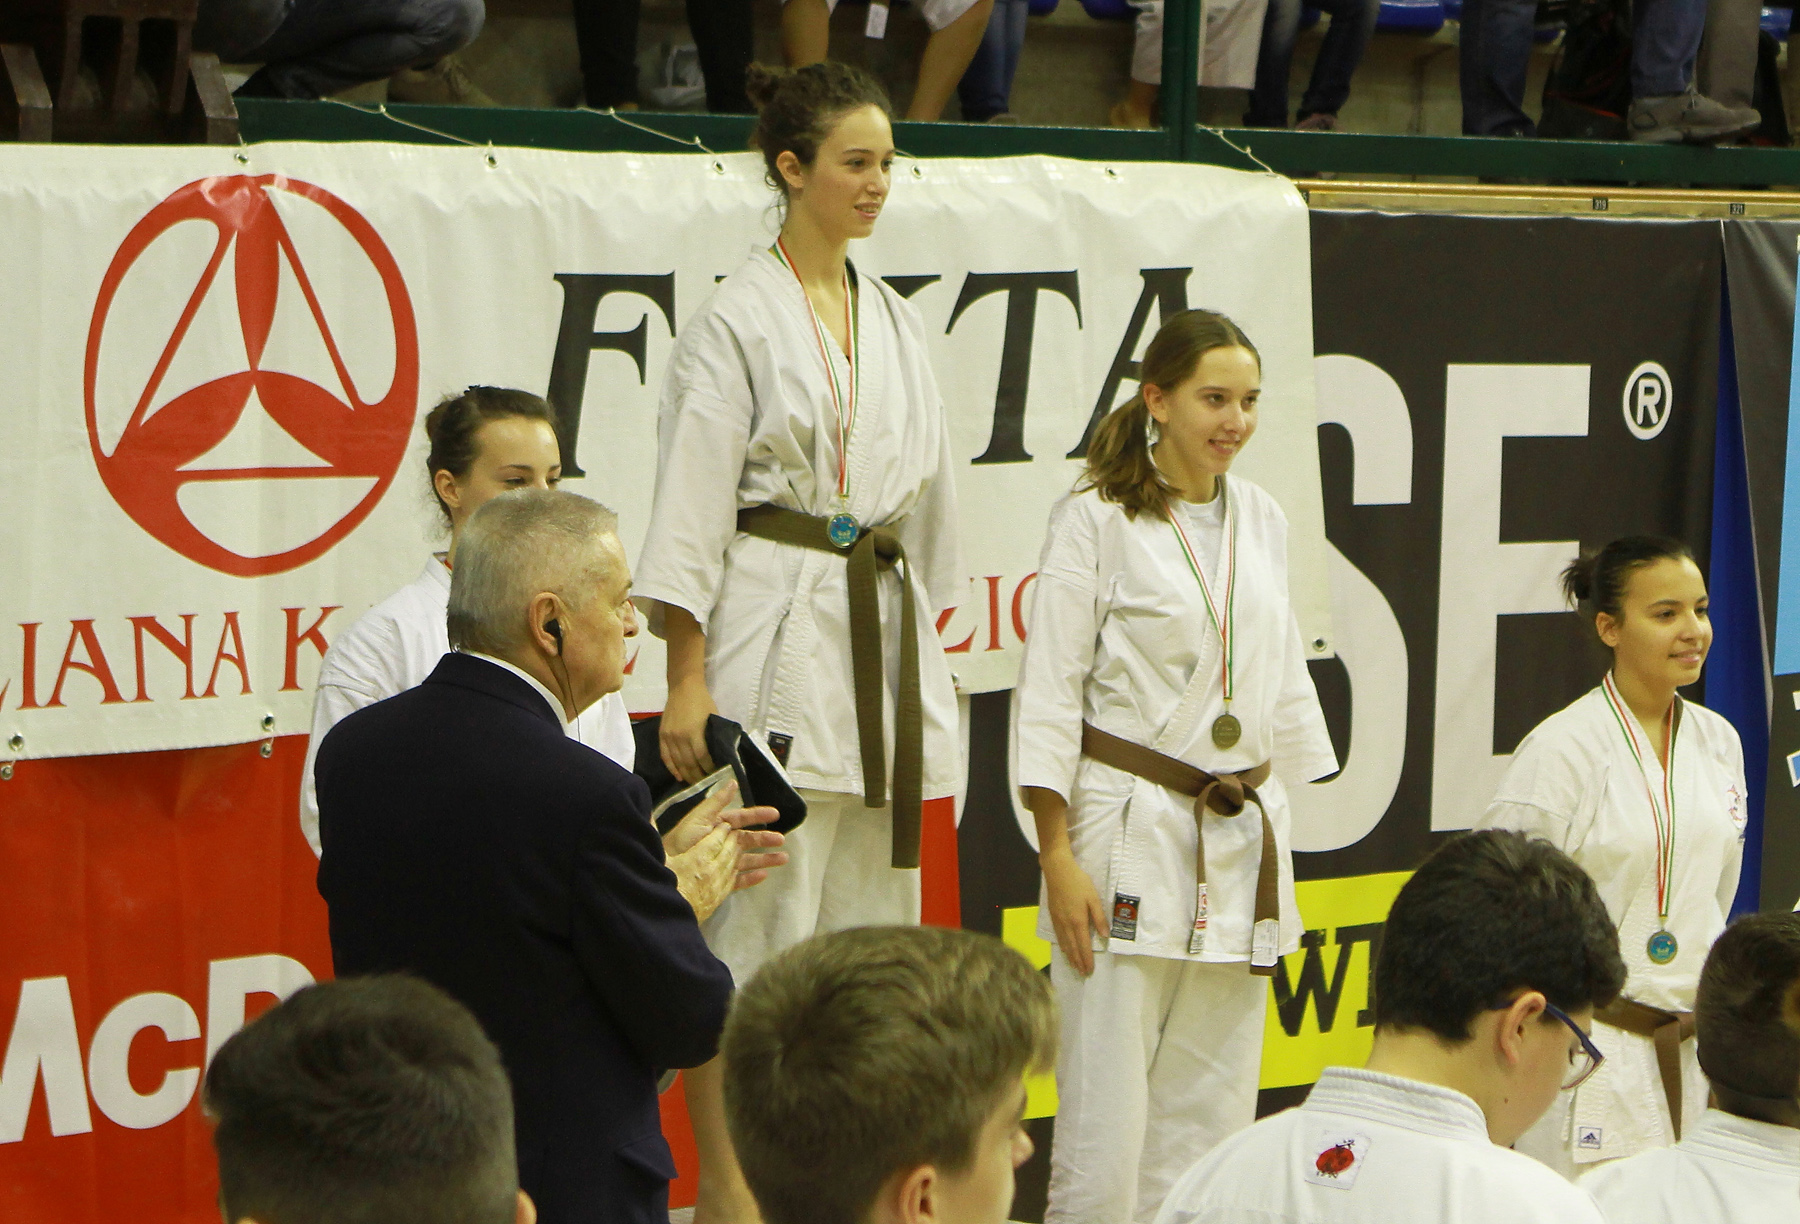 Karate, Raissa Varieschi, di Gaggiano, vince il 6° meeting europeo cat. Ragazzi